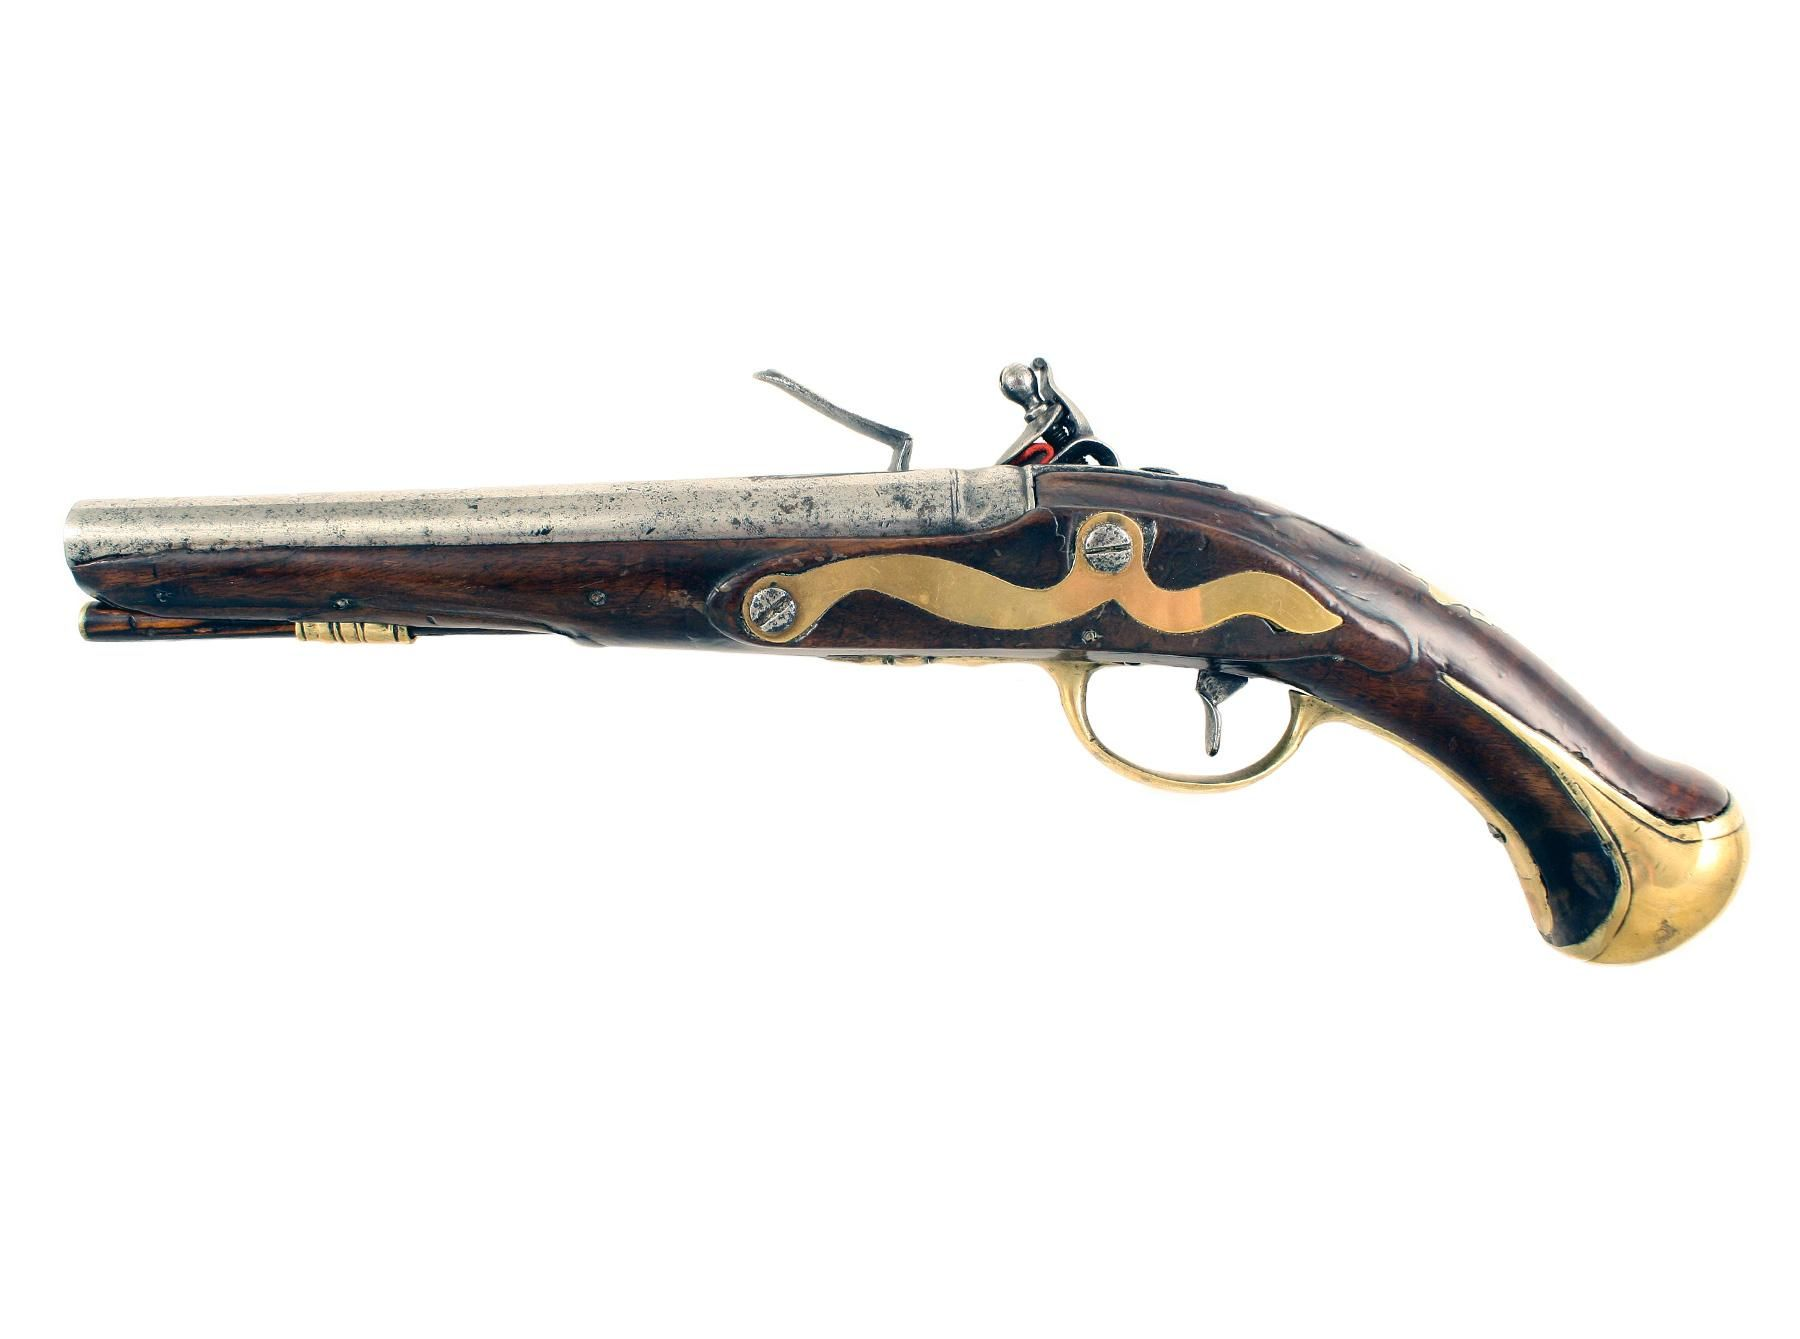 Pin By Michael On Antique Flintlock Pistols Black Powder Guns Flintlock Pistol Flintlock